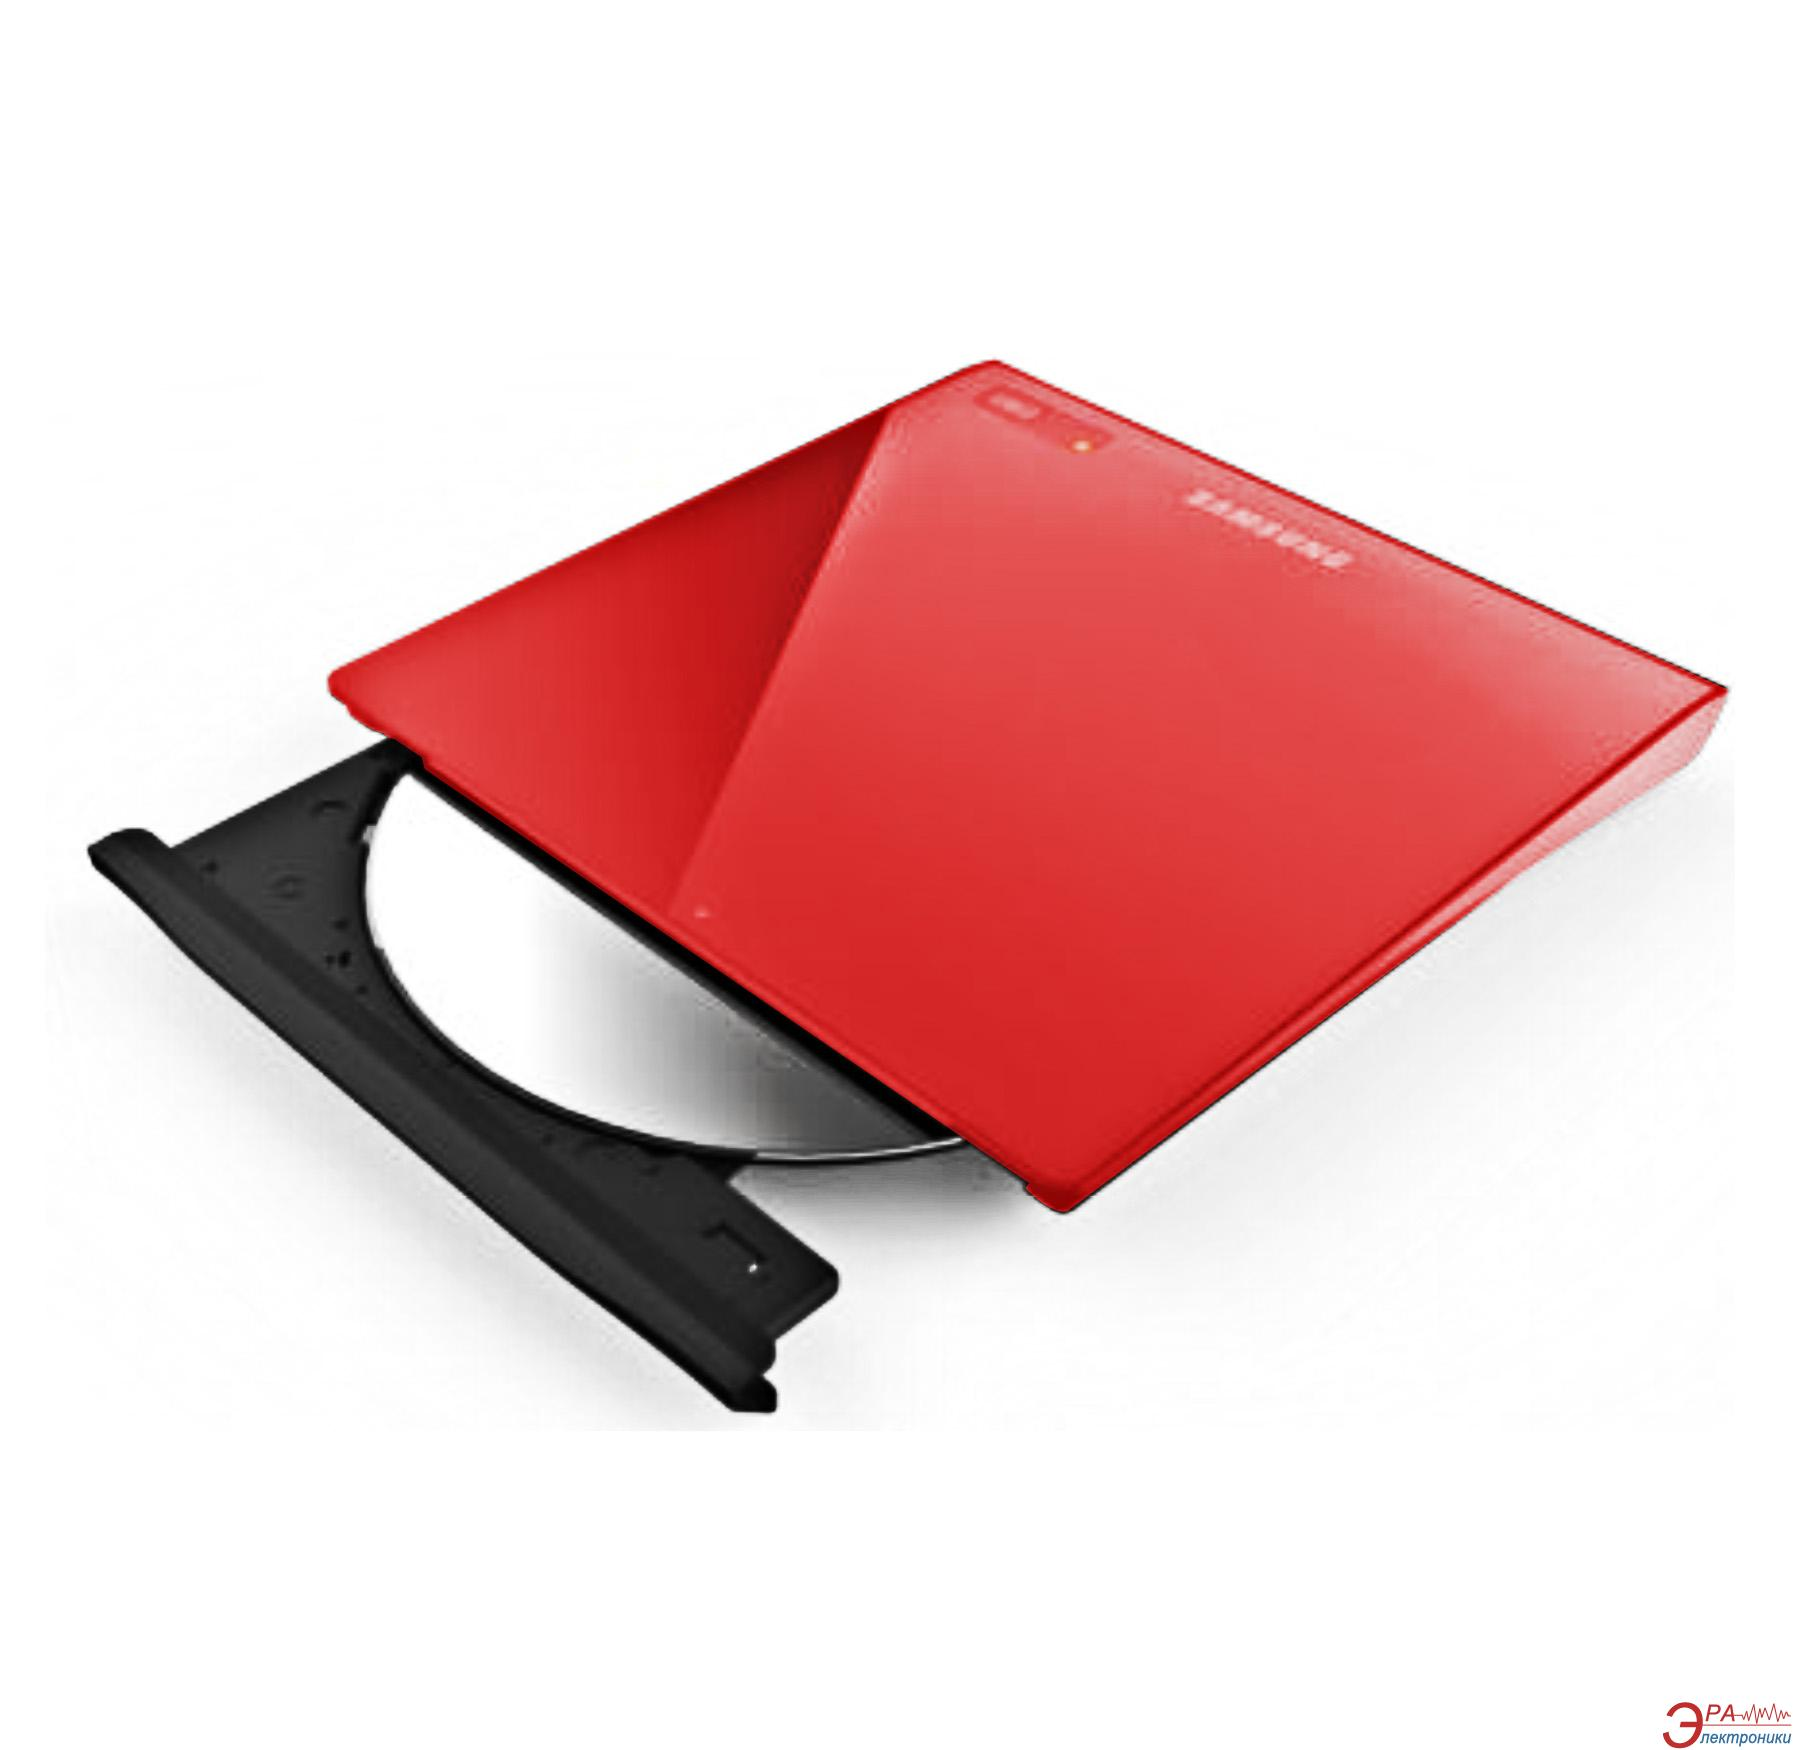 DVD±RW Samsung SE-208GB/RSRD External USB Red